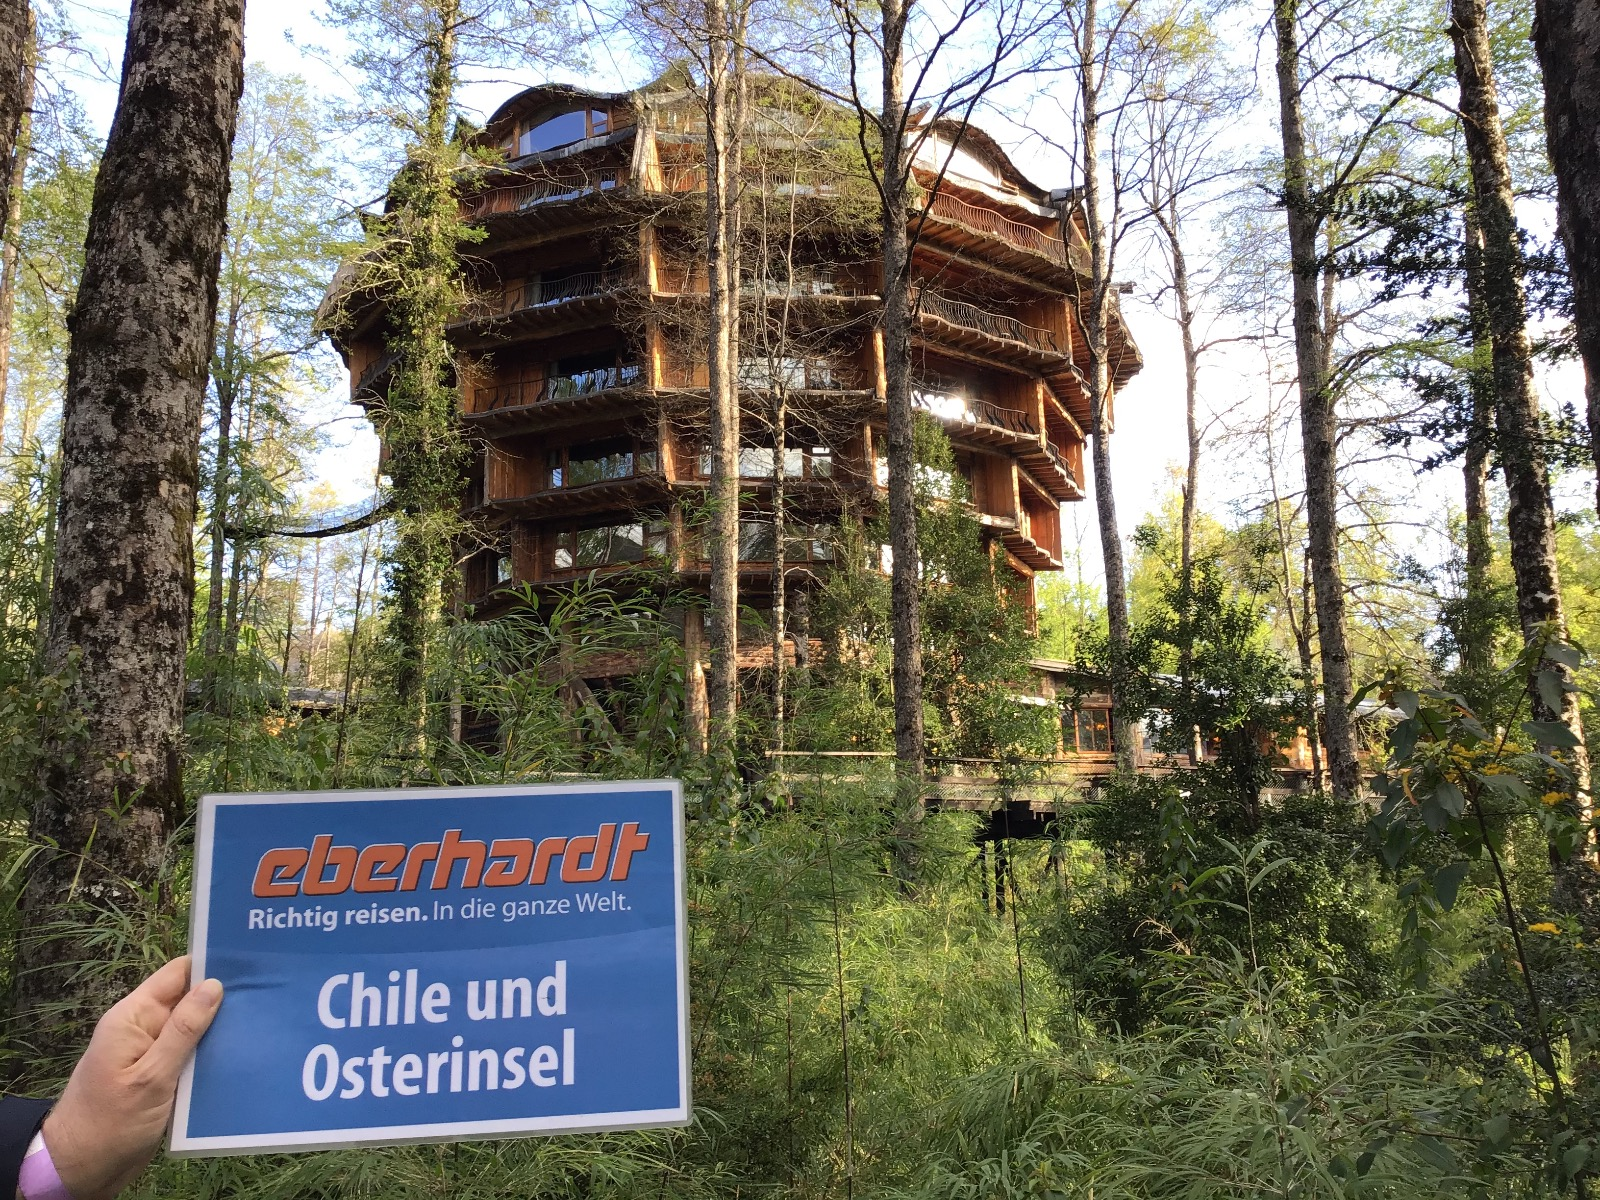 https://www.eberhardt-travel.de/reisebilder/reisetipp/das-baumhaus-hotel/original/1846509